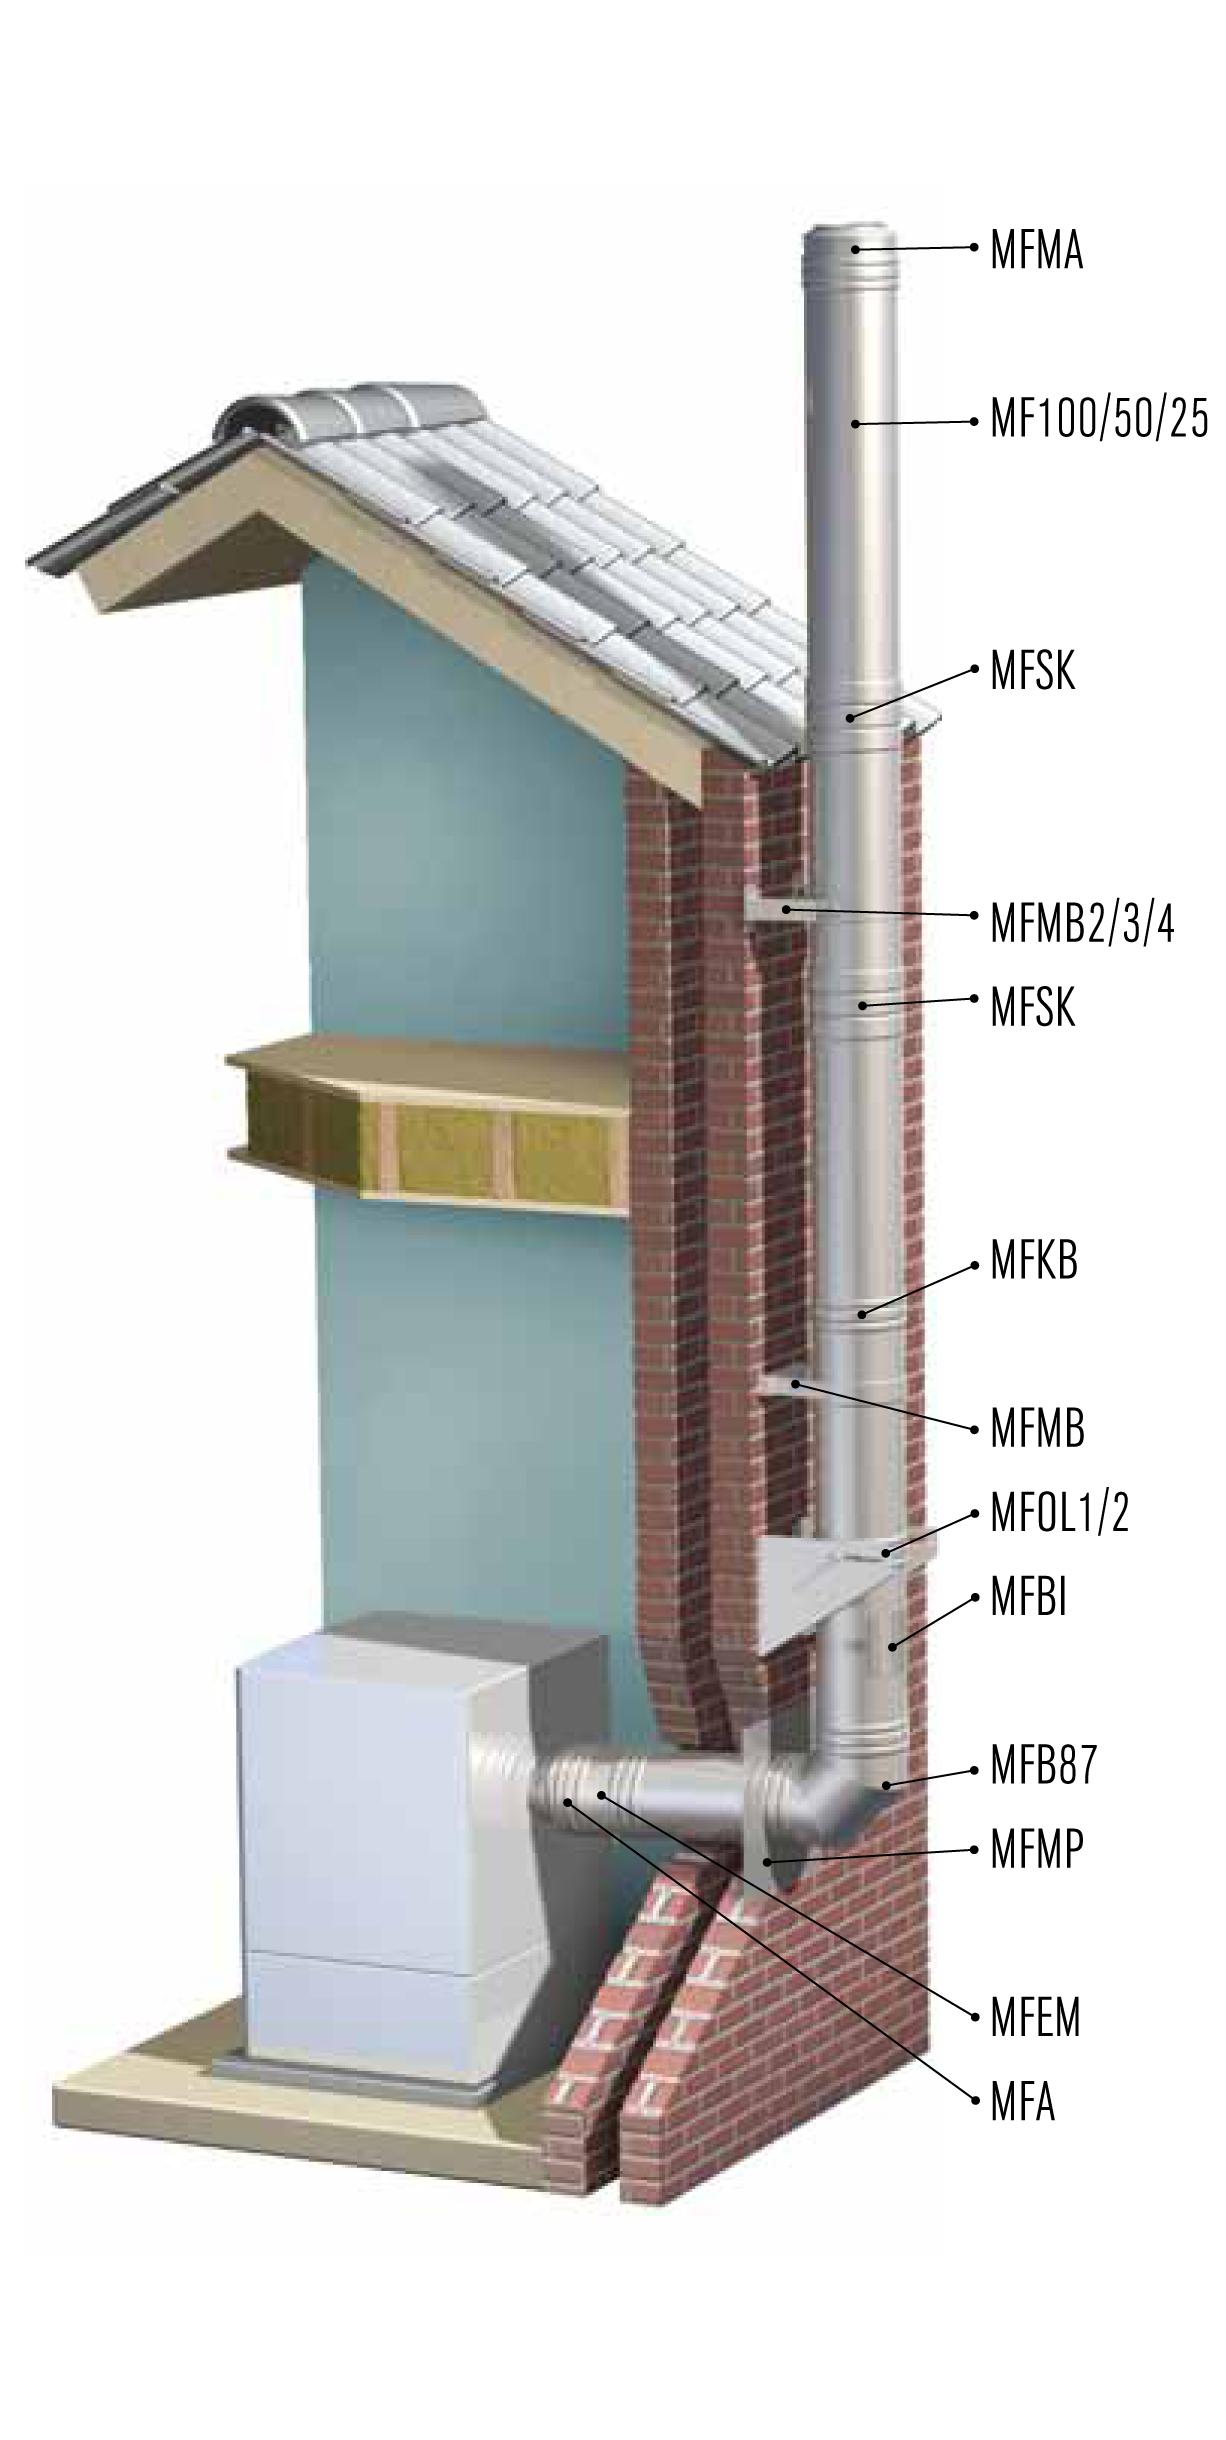 metaloterm-mf-systemaufbau